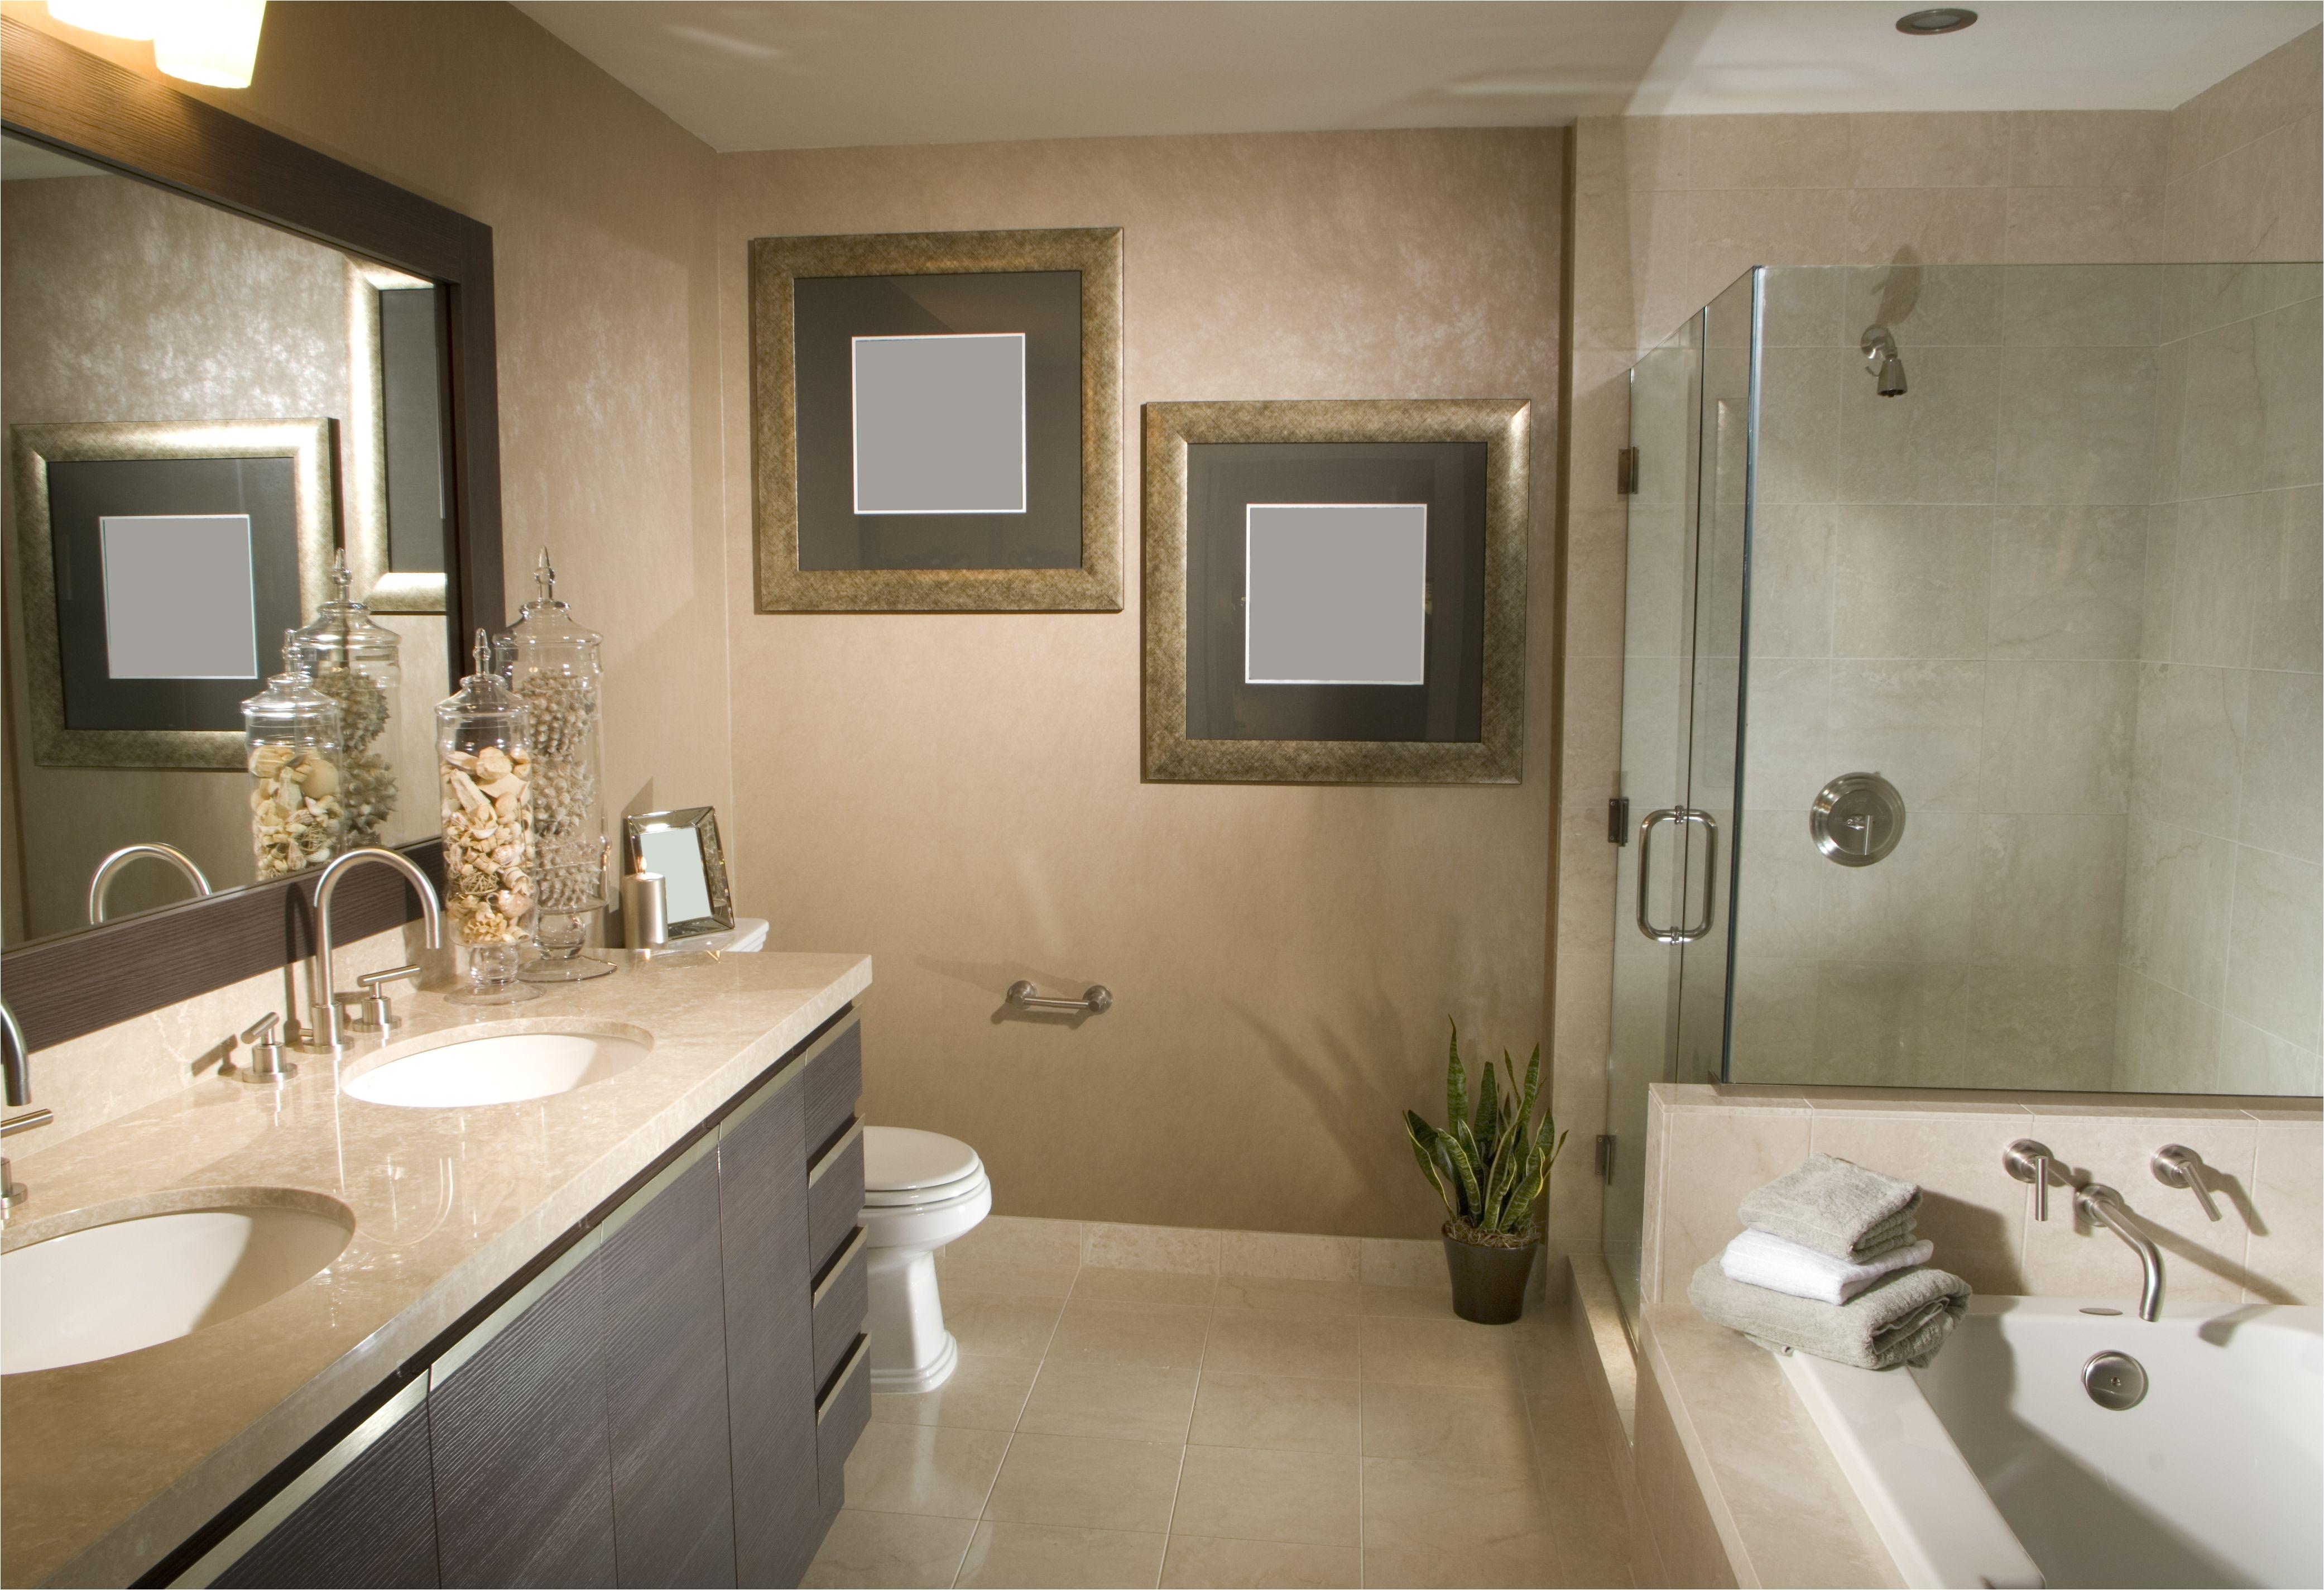 architecture stock bath room design photo images 57f df78c690f9d37a8